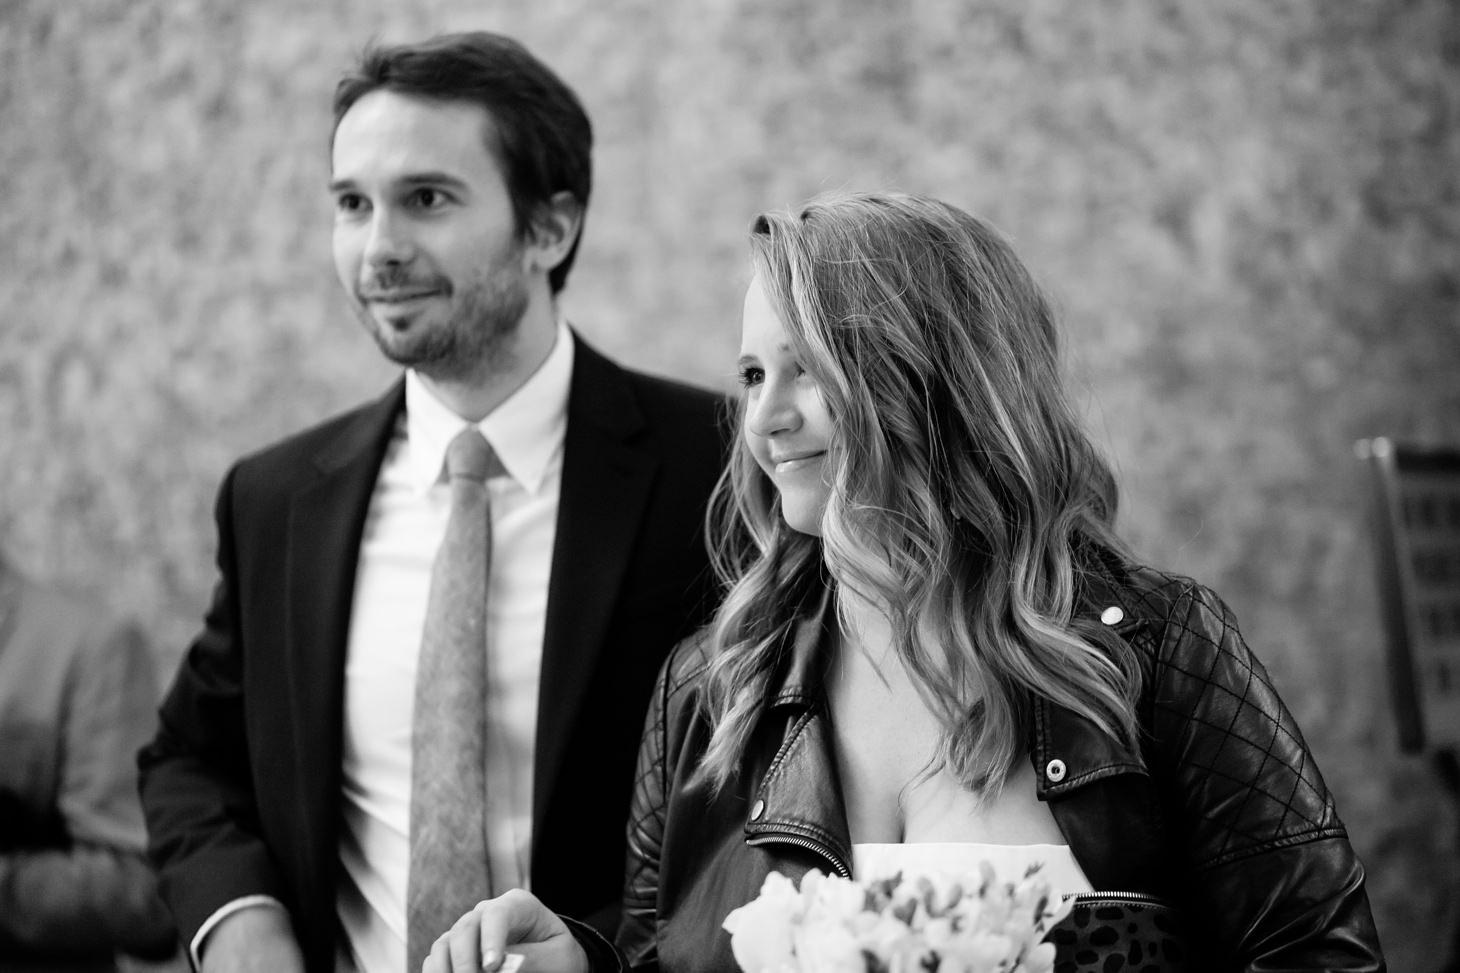 009-NYC-Intimate-Wedding-photography-SmittenChickens-city-hall-lauren-aaron.jpg